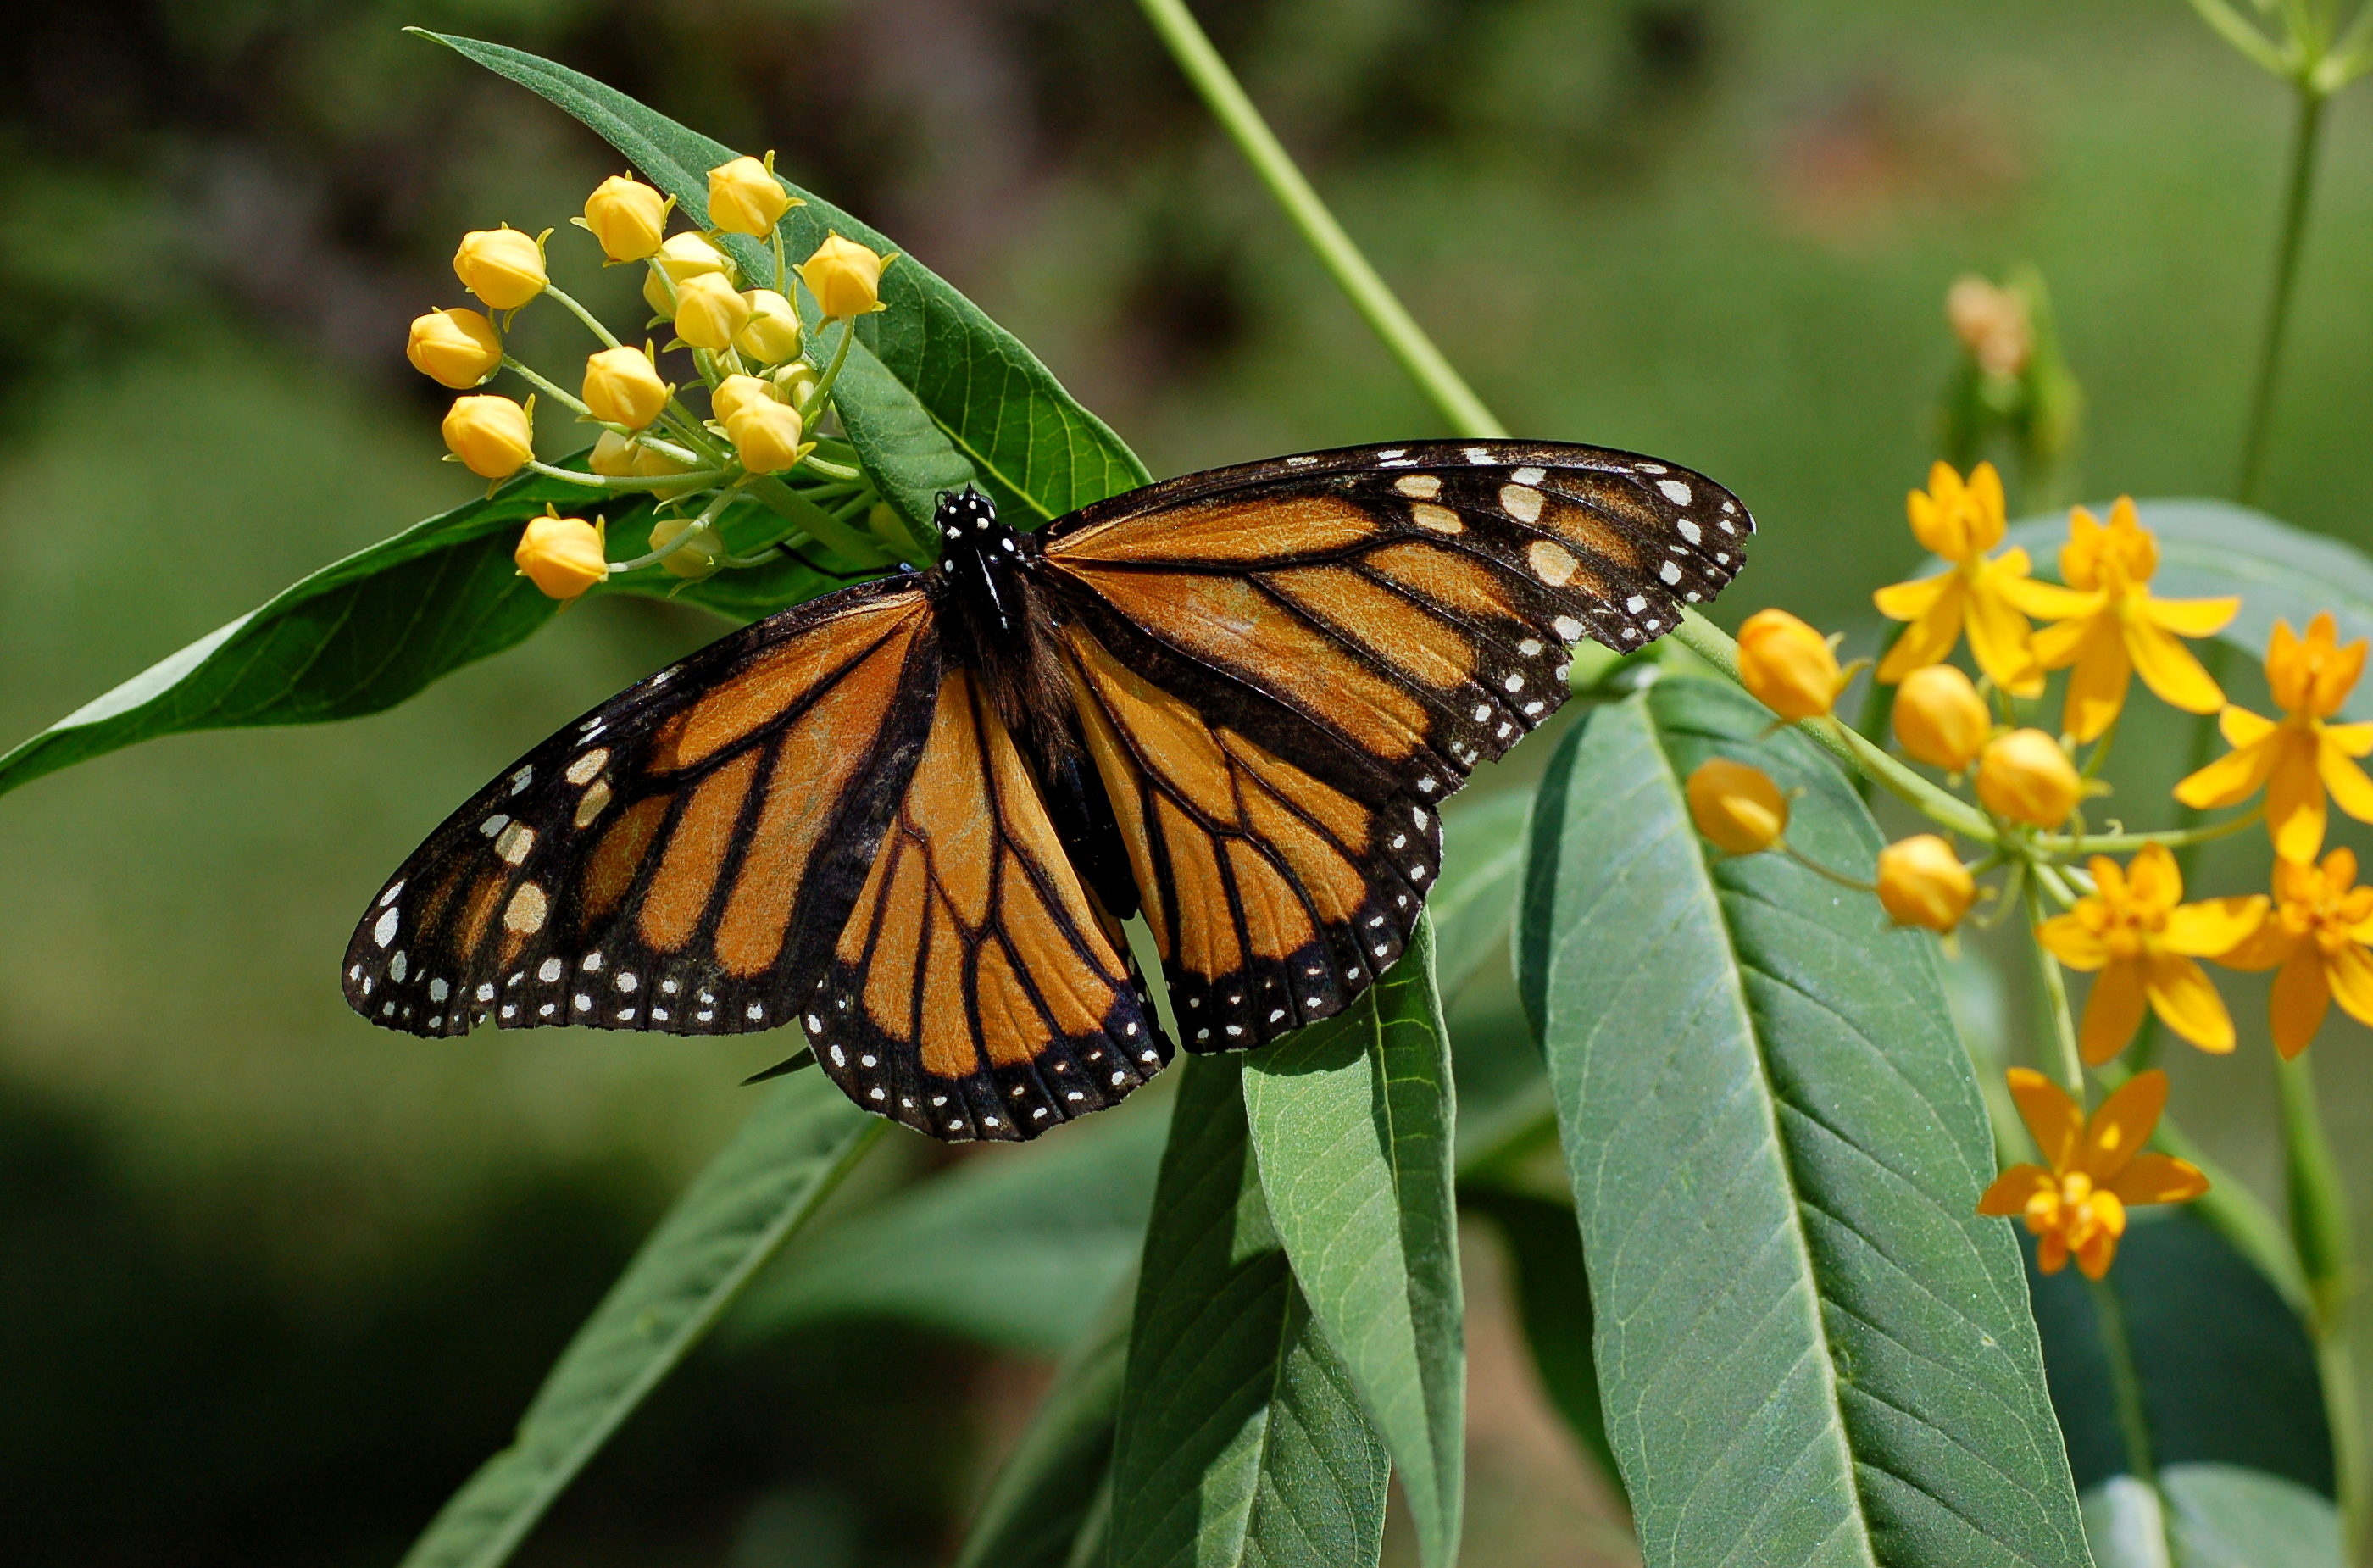 http://upload.wikimedia.org/wikipedia/commons/0/0a/Monarch_Butterfly_Danaus_plexippus_on_Milkweed_Hybrid_2800px.jpg